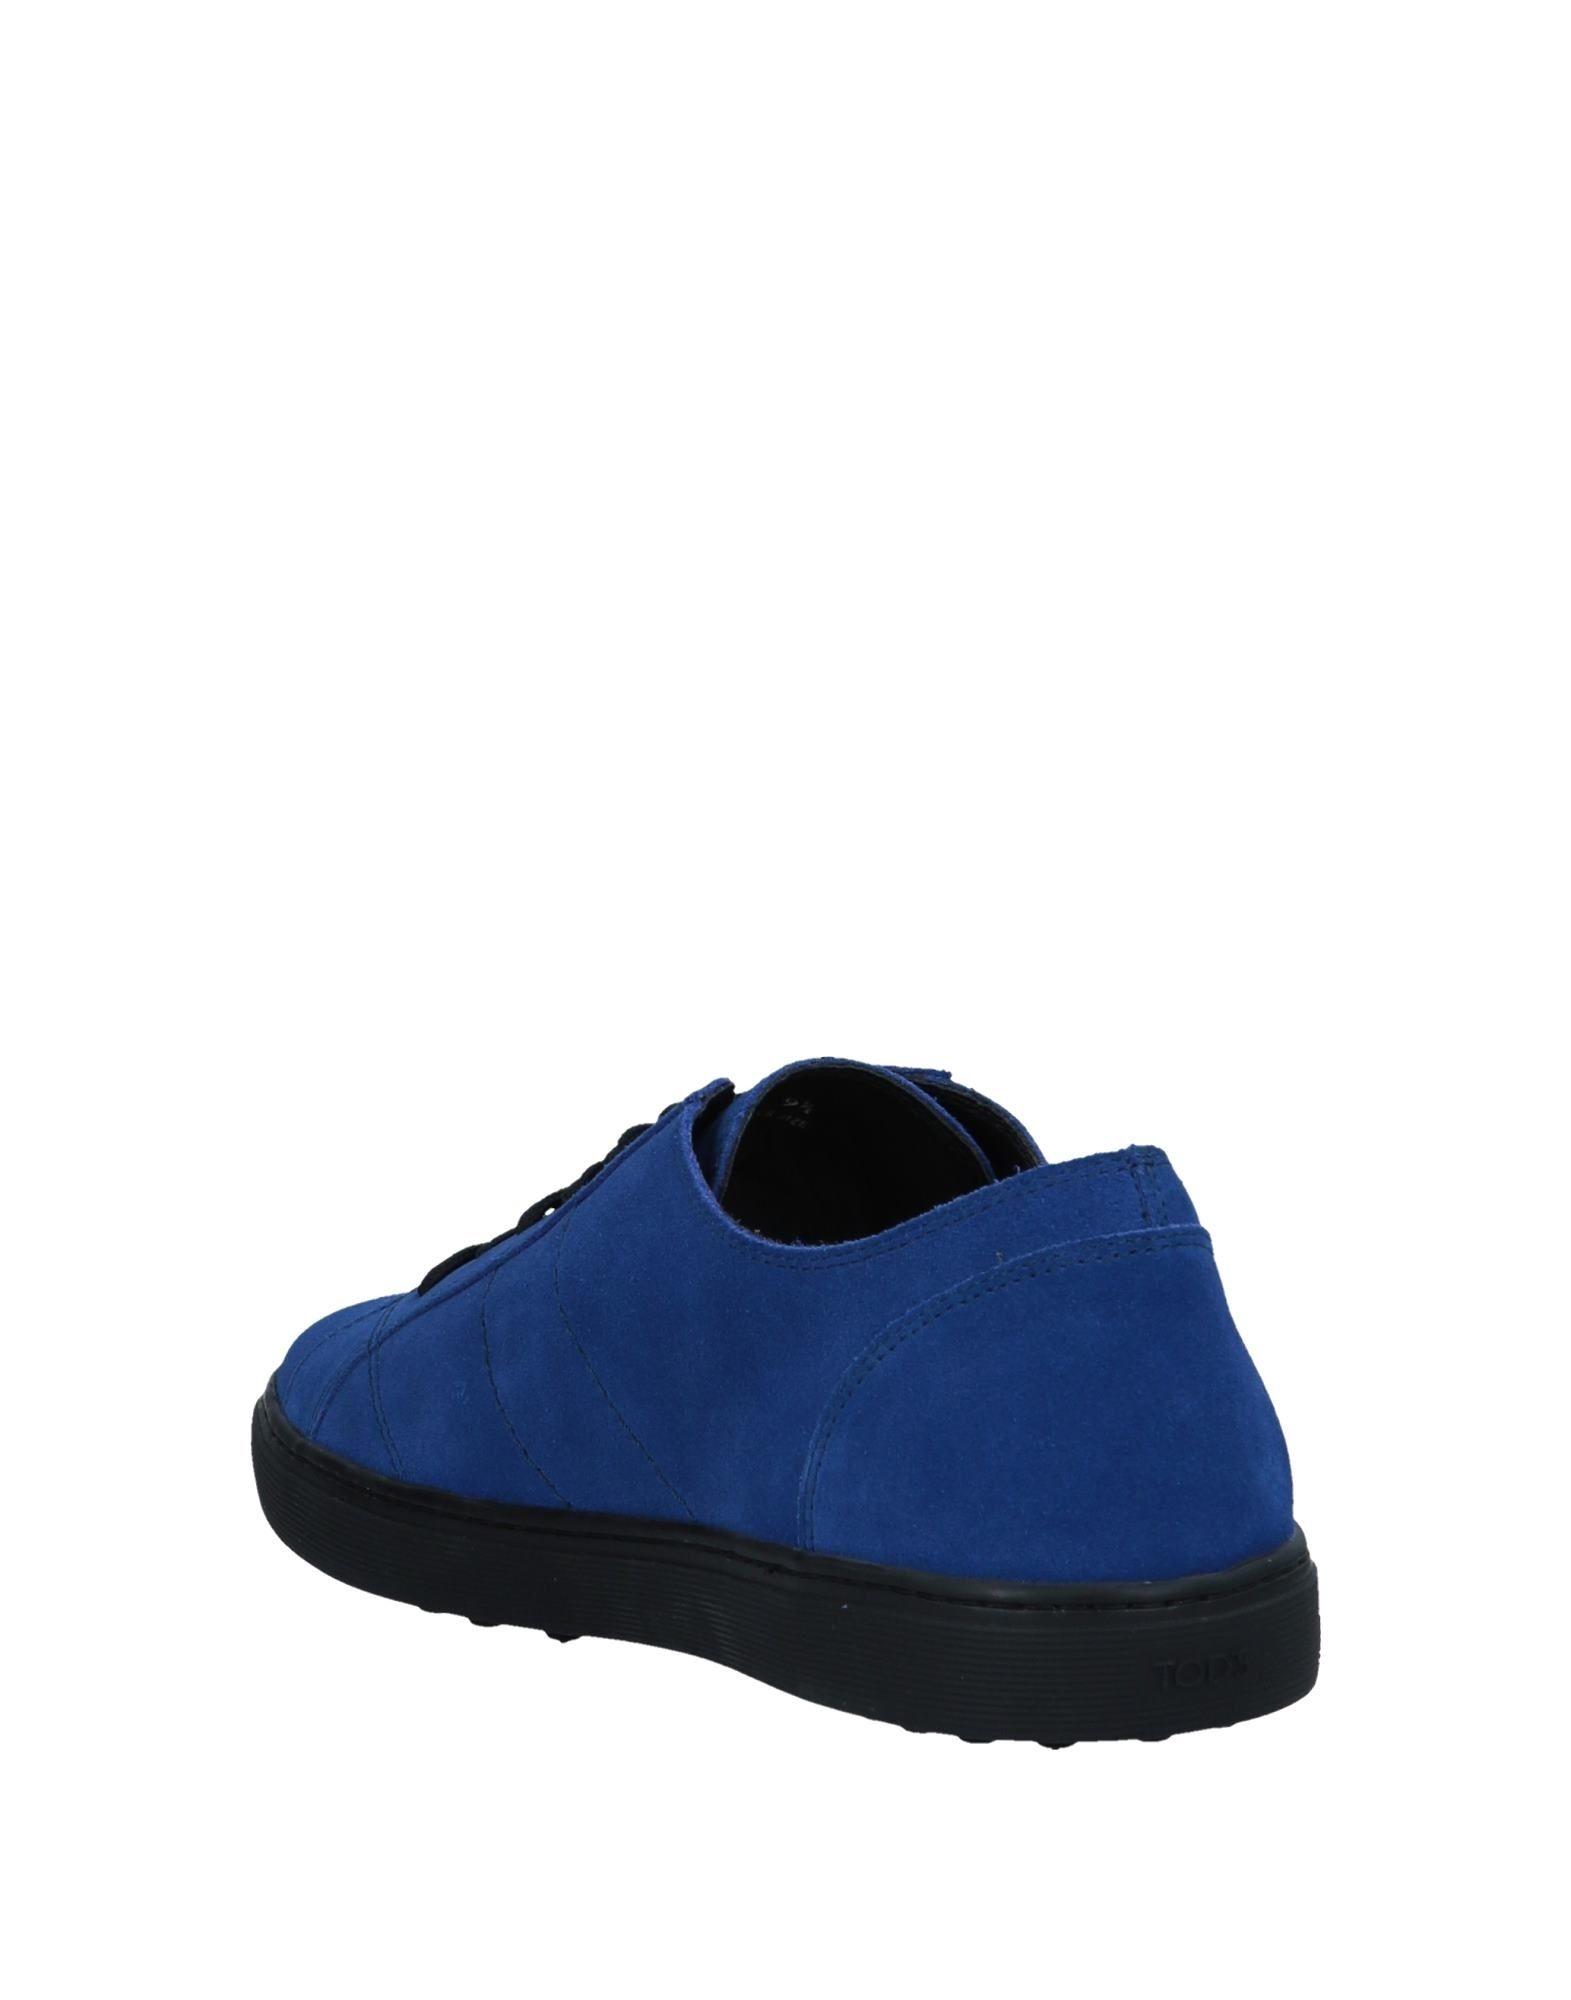 Tod's Sneakers Herren Qualität  11541237RB Gute Qualität Herren beliebte Schuhe 16208a